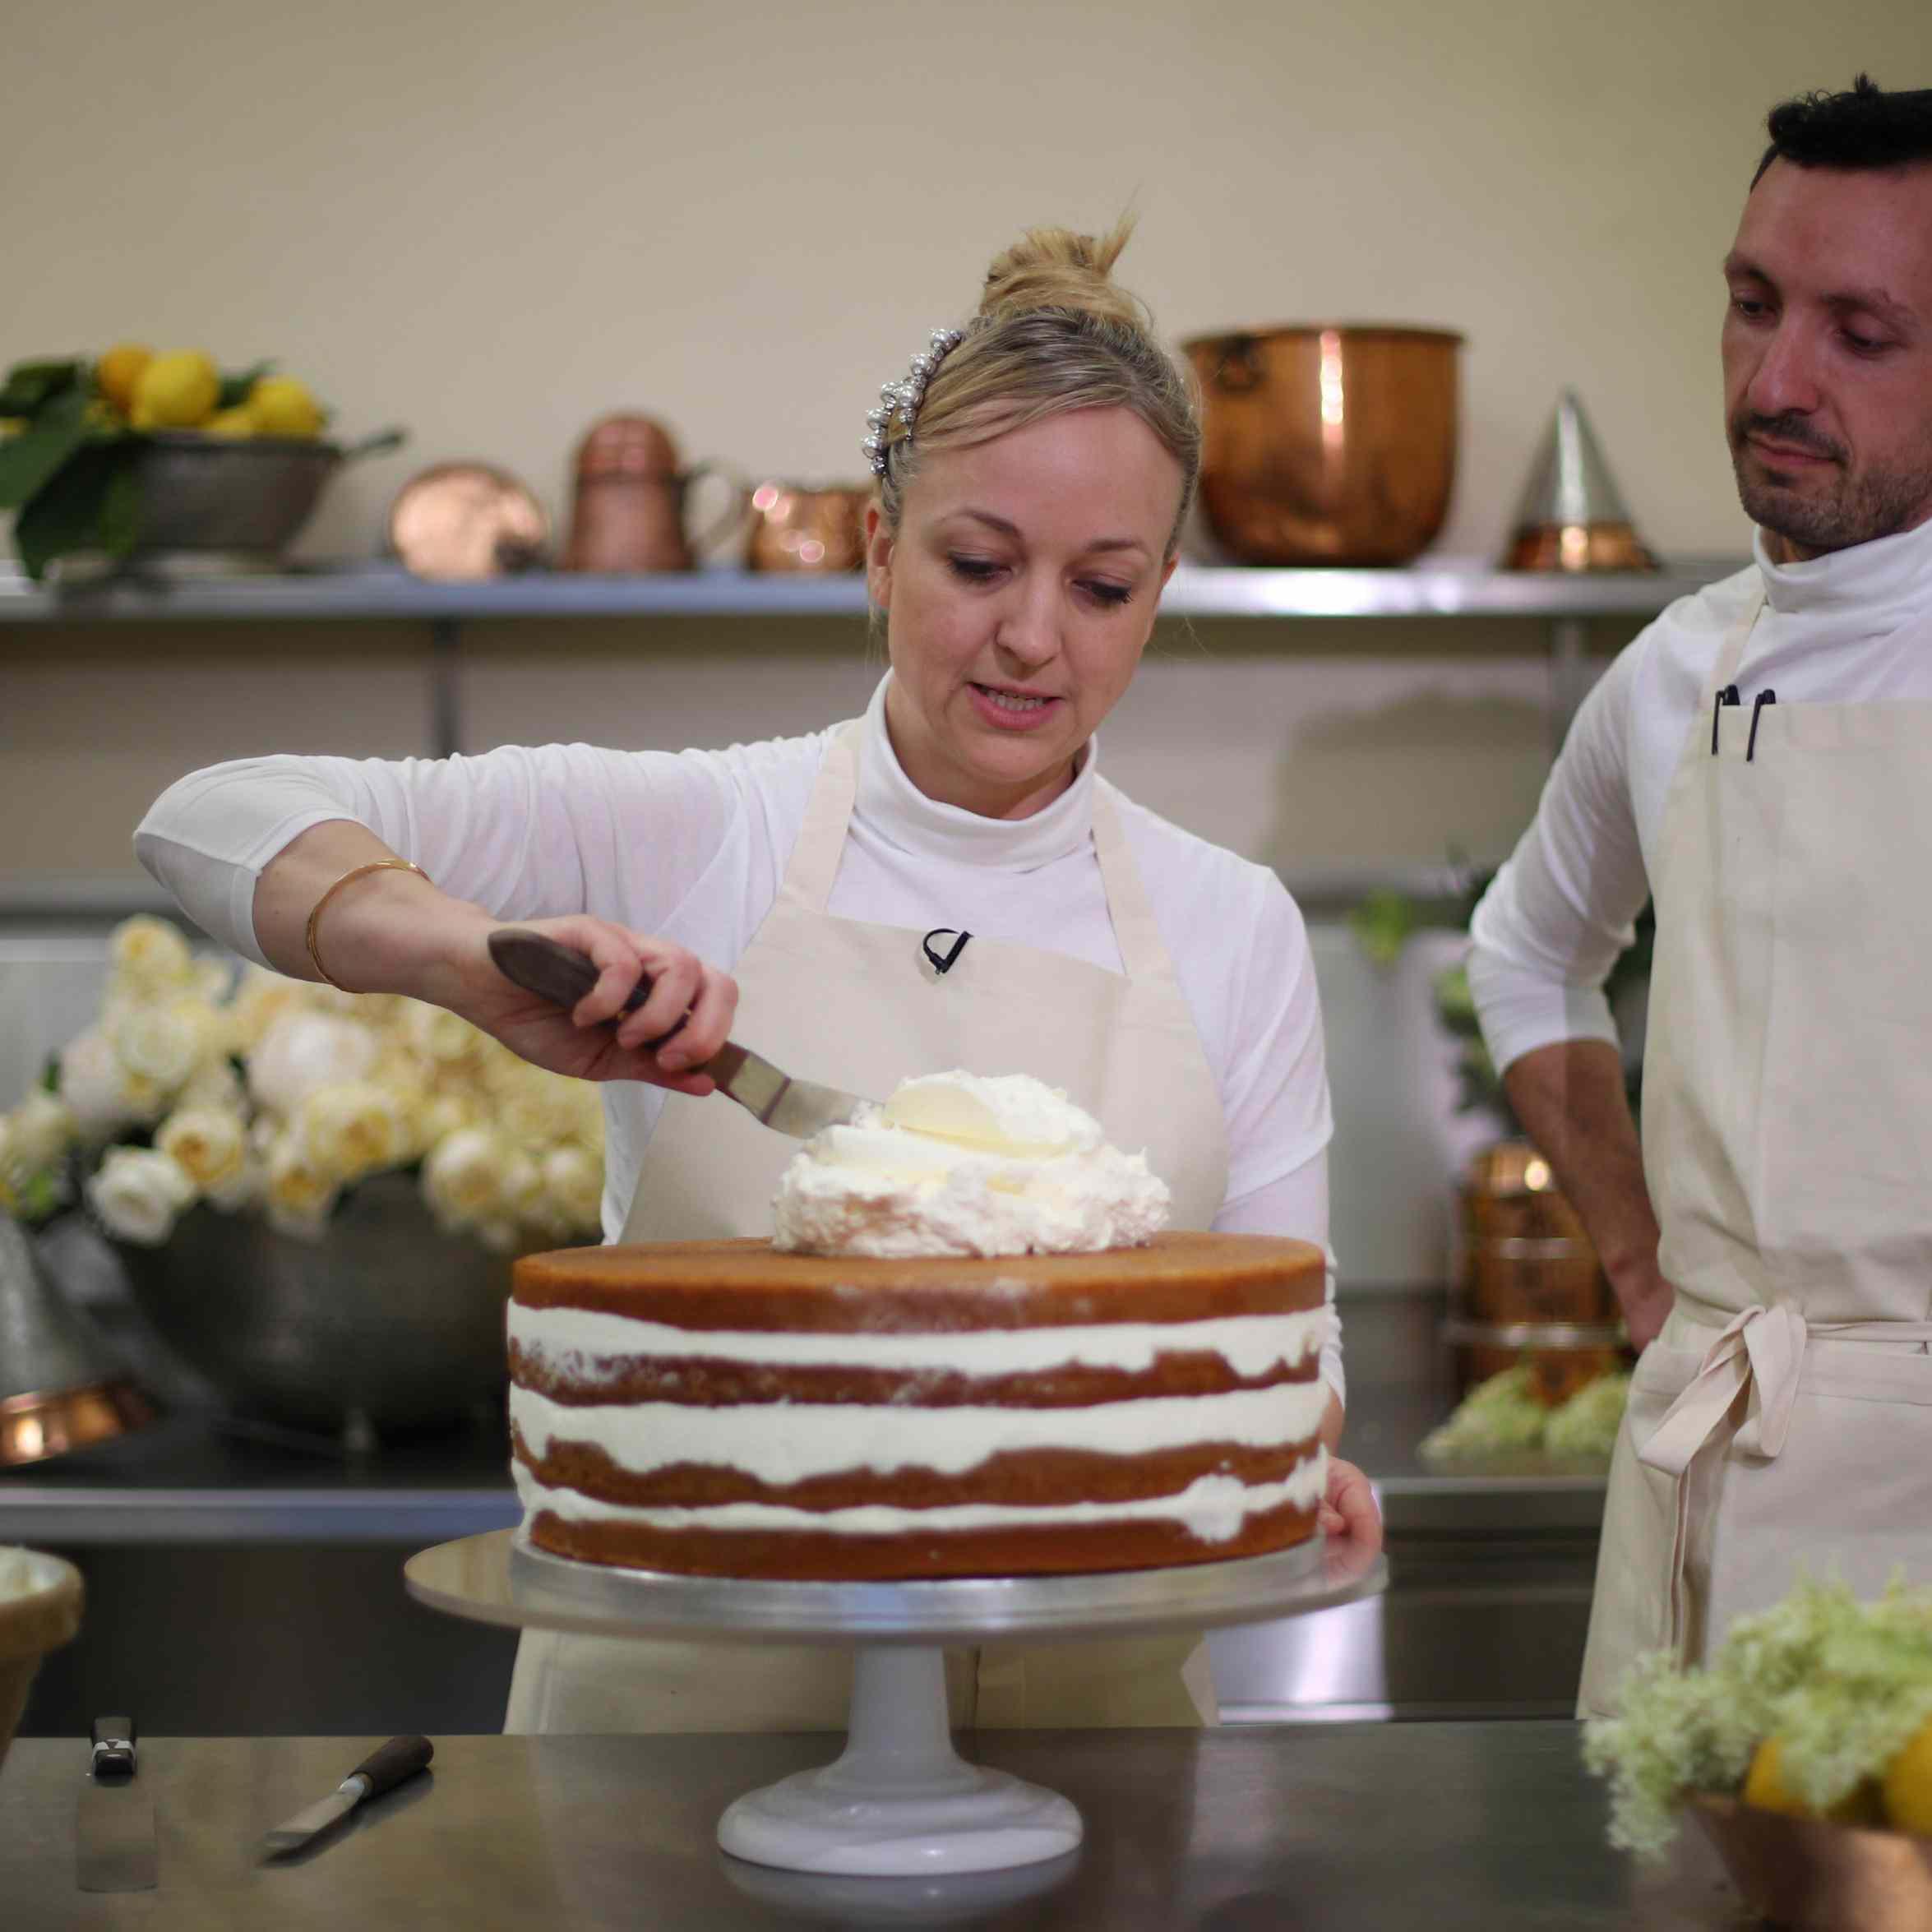 Meghan Markle Wedding Cake.Prince Harry And Meghan Markle S Wedding Cake Is Almost Too